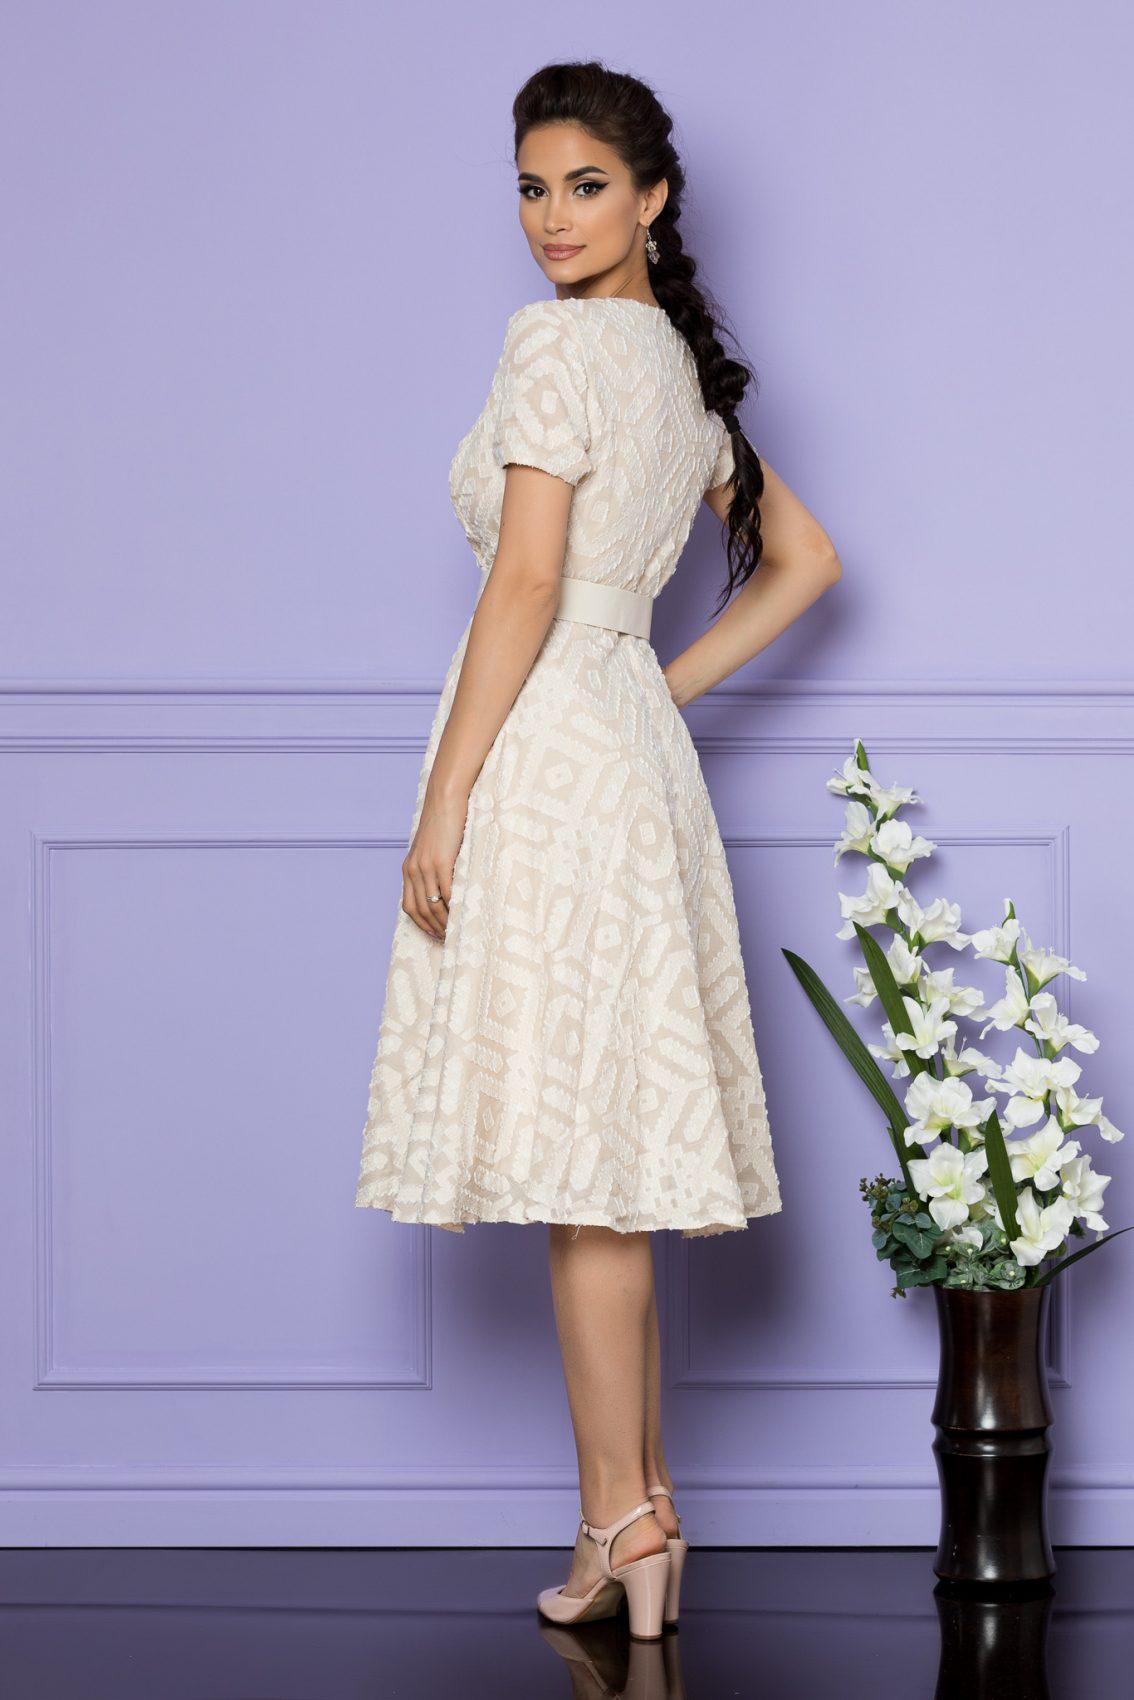 Nude Μίντι Κρουαζέ Φόρεμα Patricia A716 2